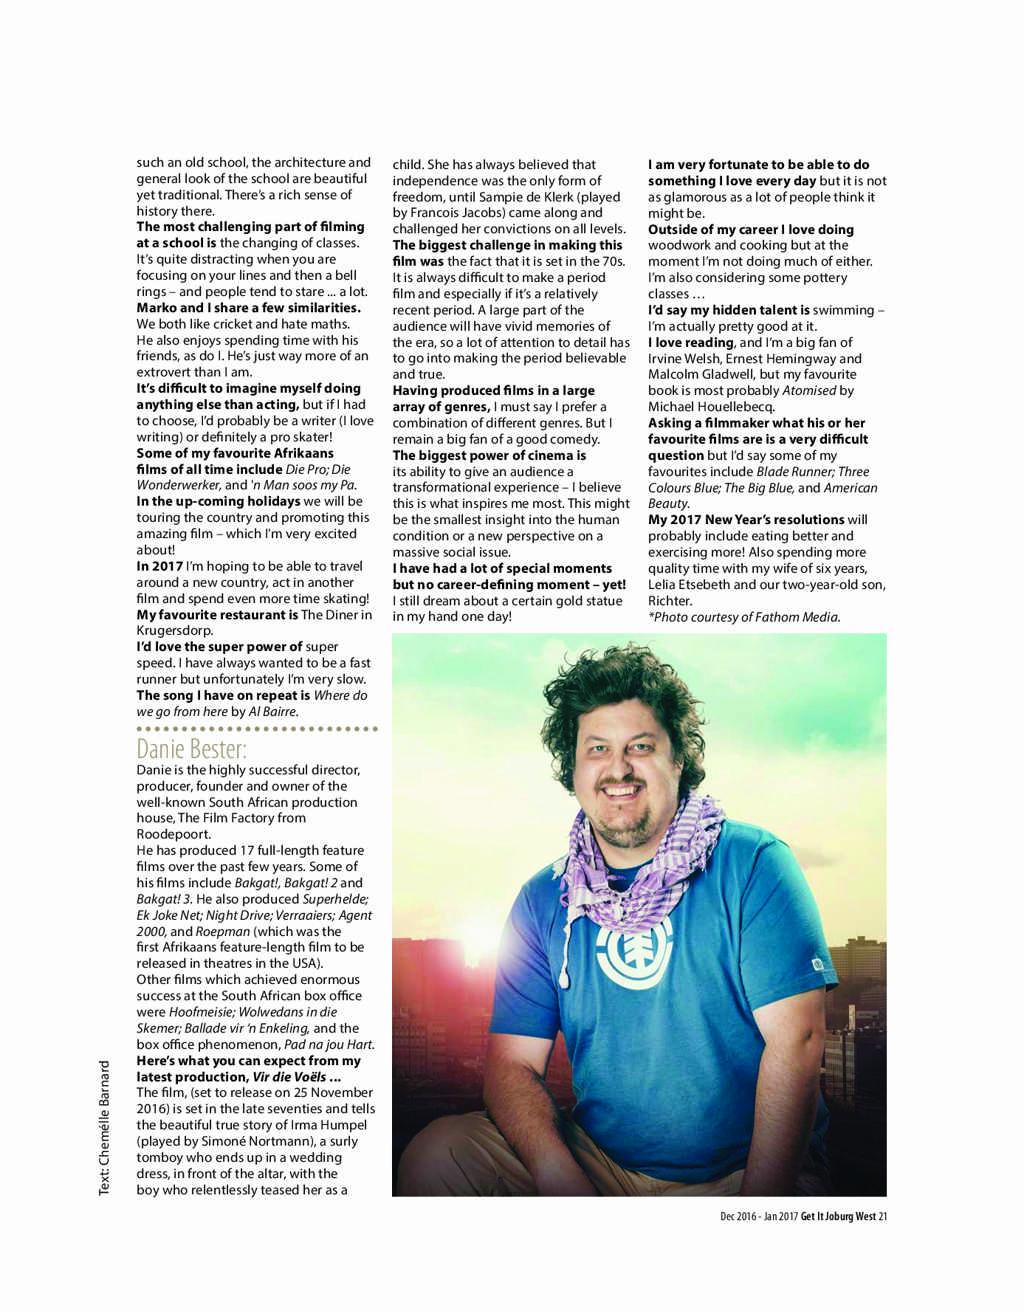 get-it-joburg-west-dec-2016-jan-2017-epapers-page-21